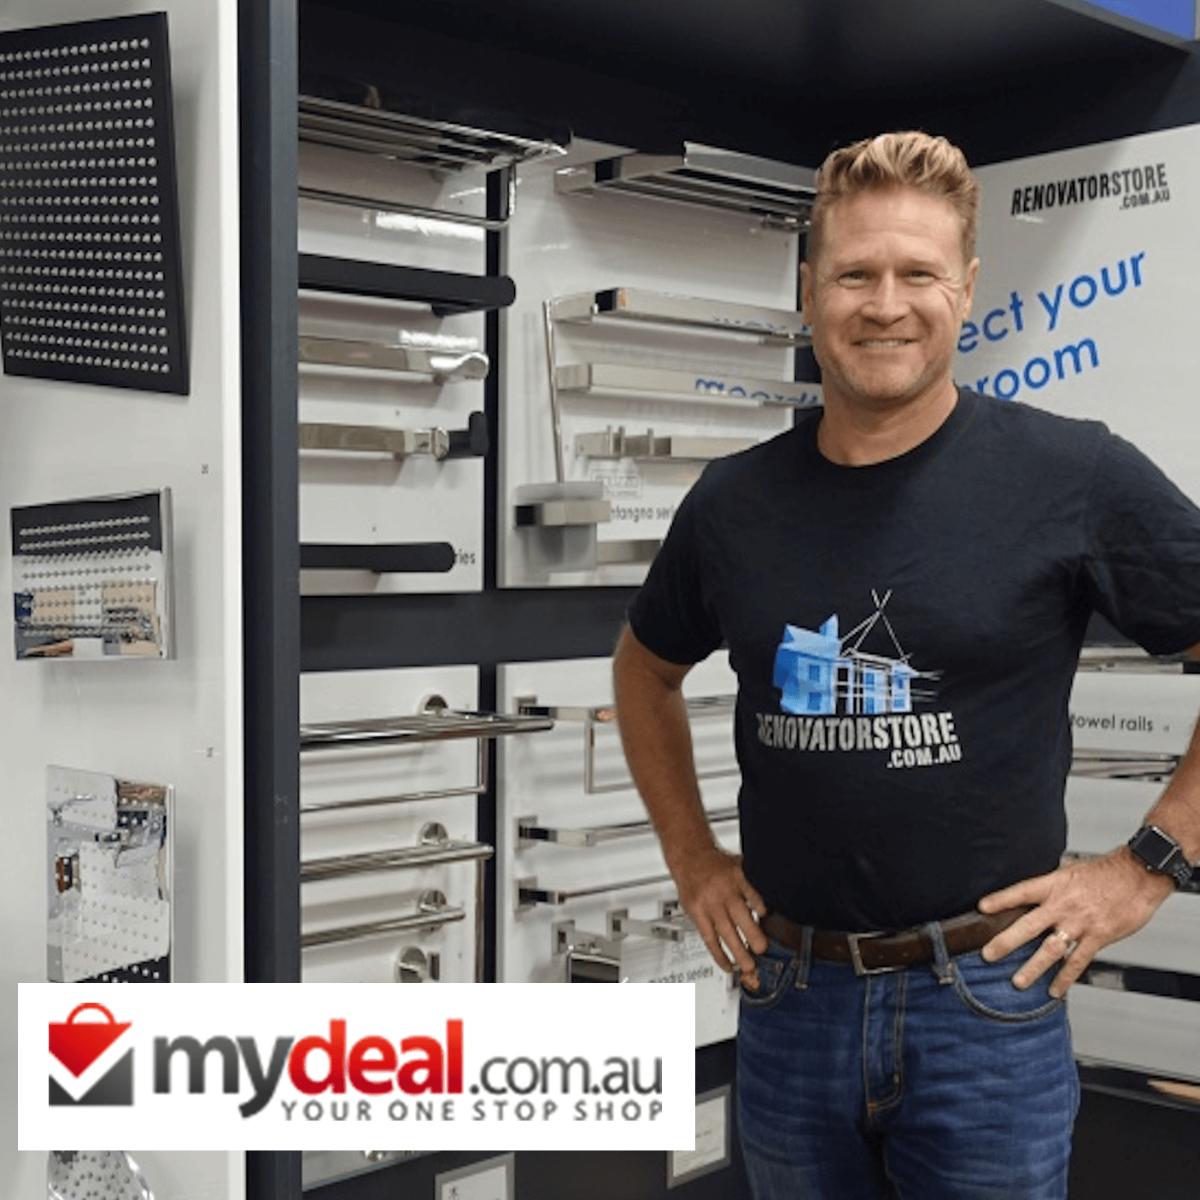 inspiring career change story - scott pendlebury of renovator store